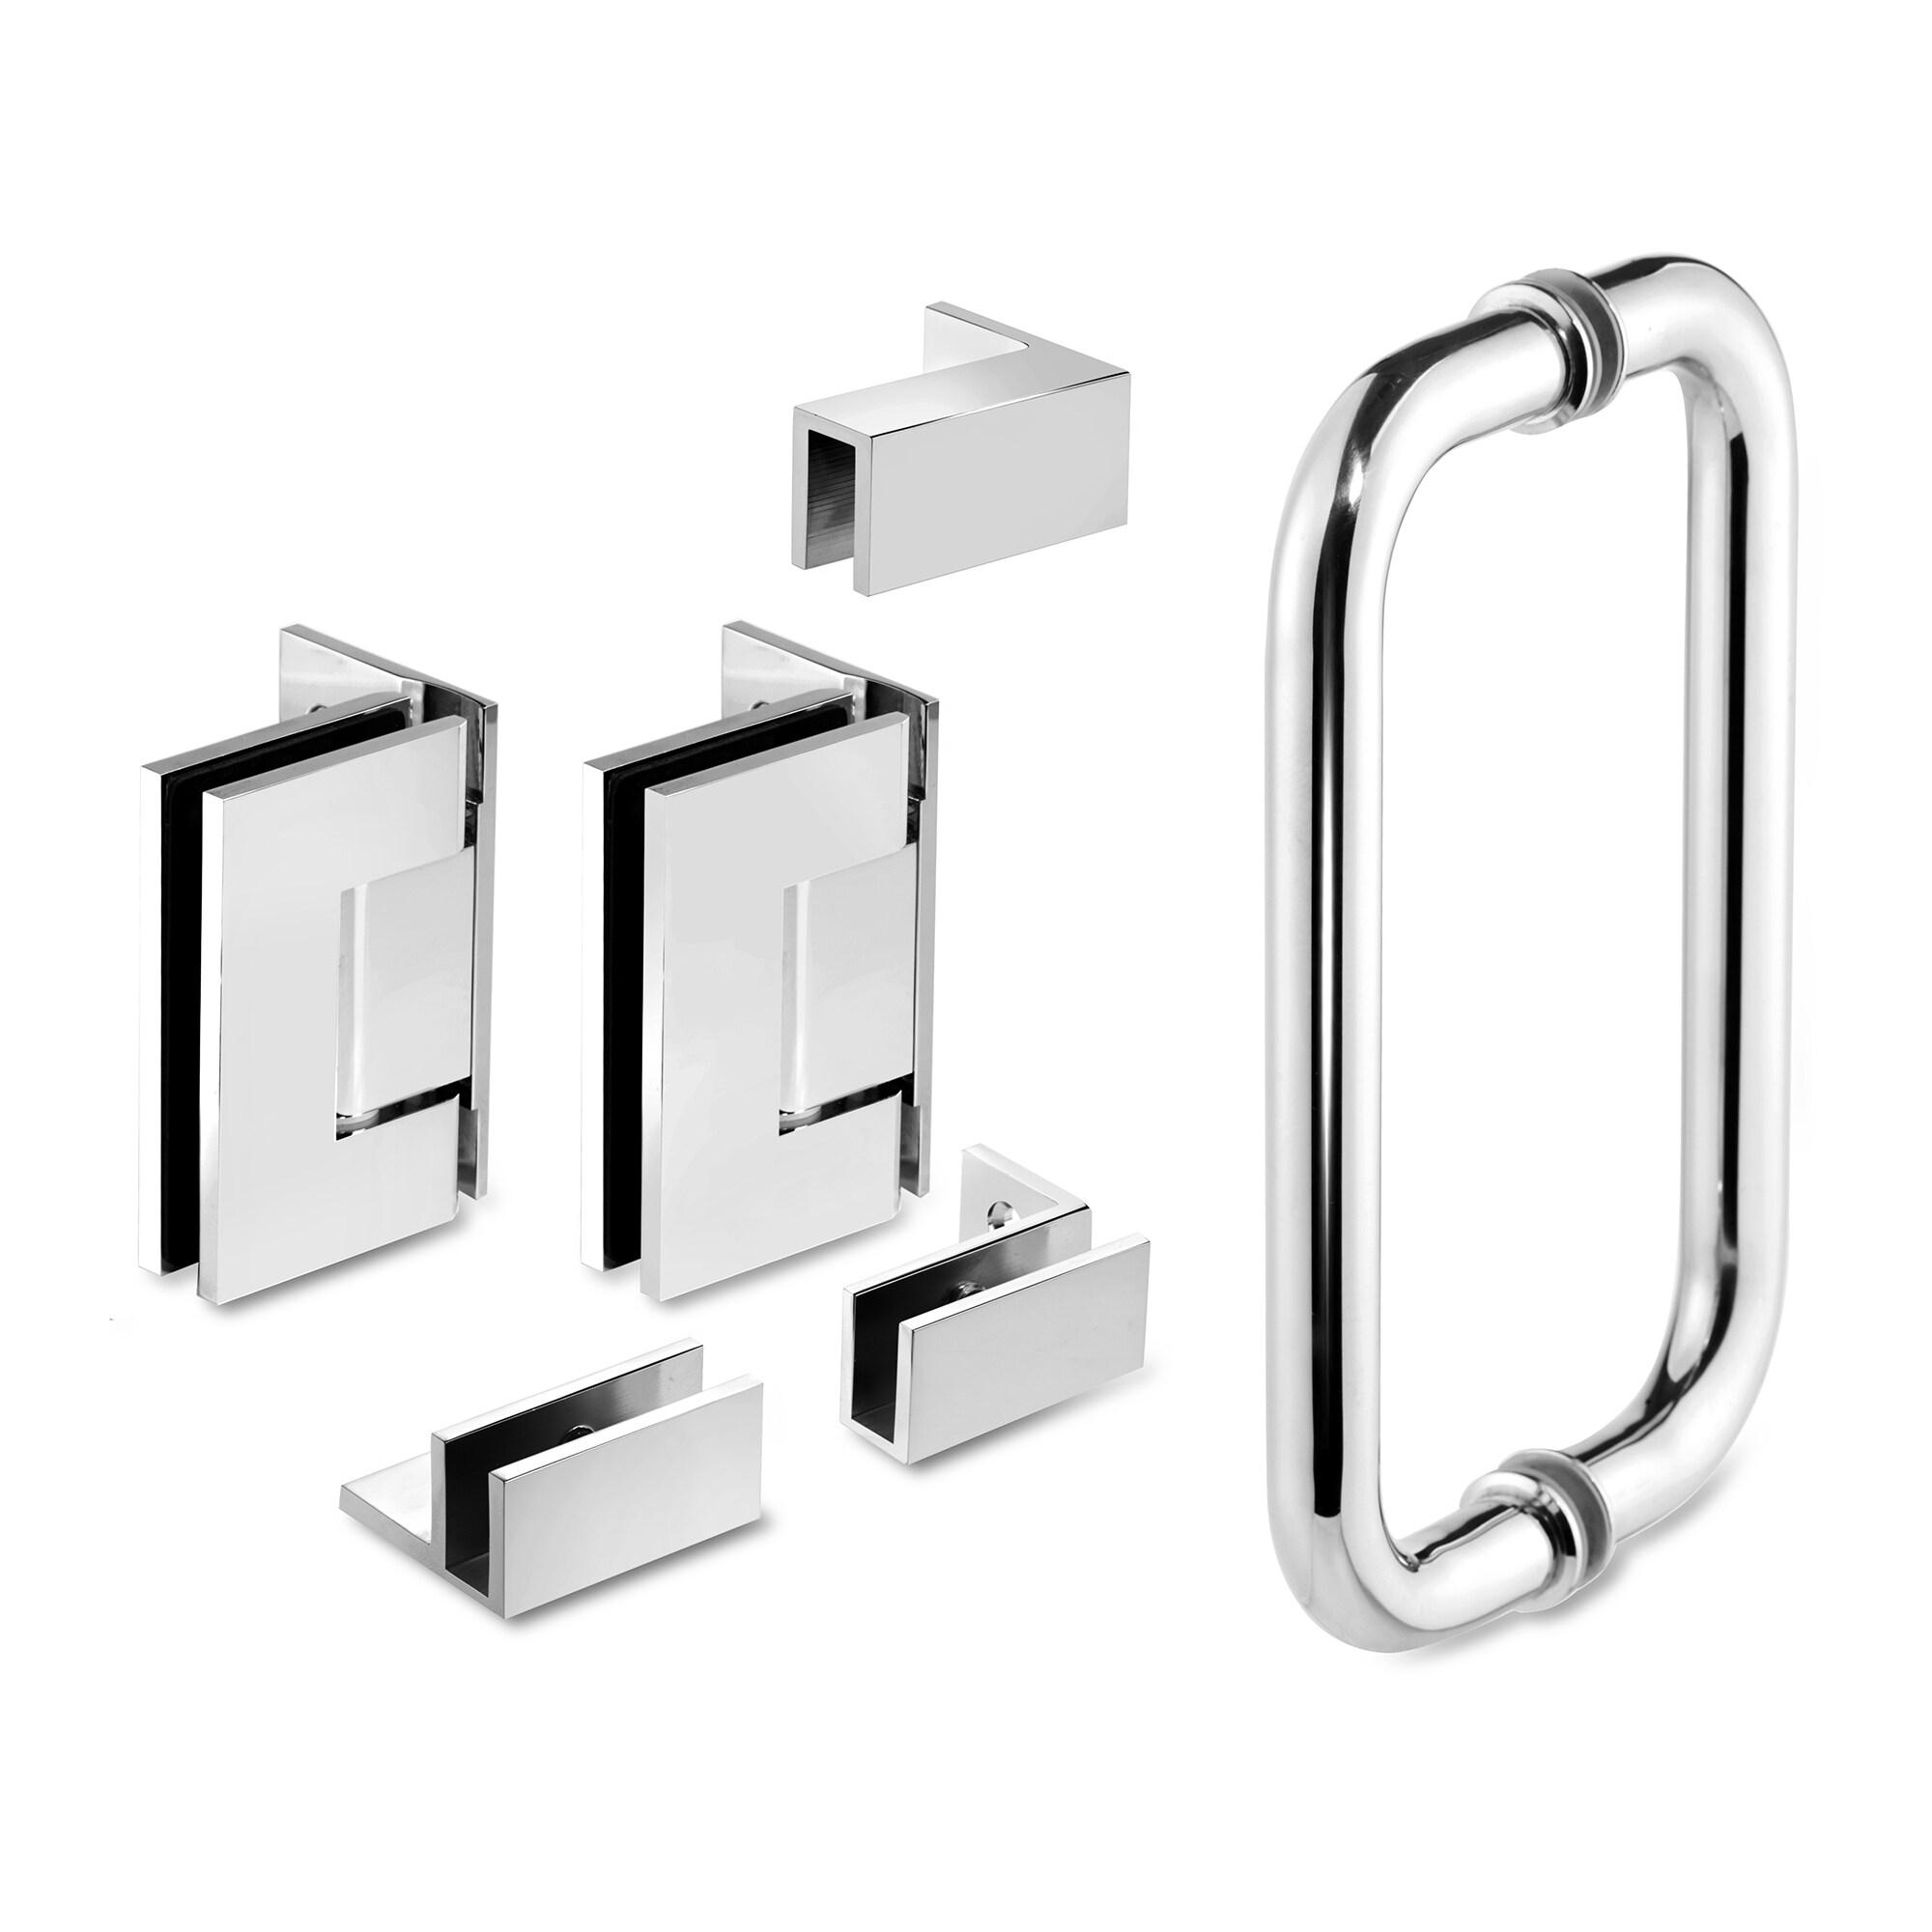 38 25 X 76 Hinged Frameless Shower Door Panel Reversible Overstock 30894987